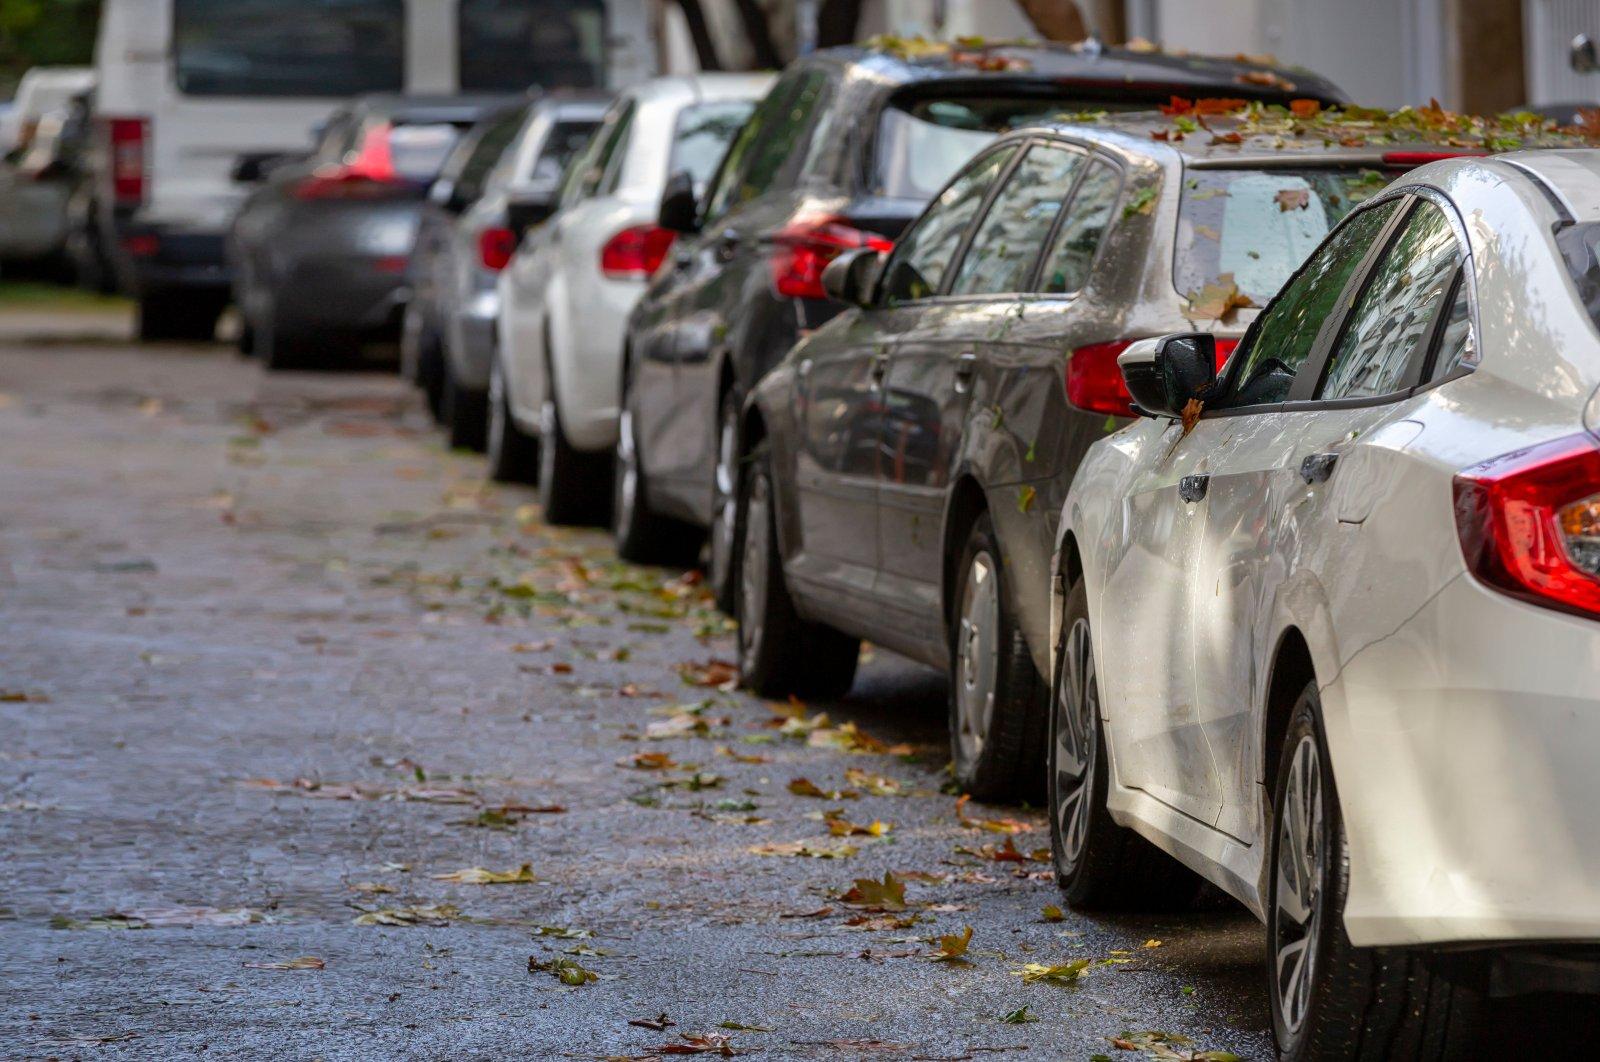 Cars parked along a street. (Shutterstock Photo)